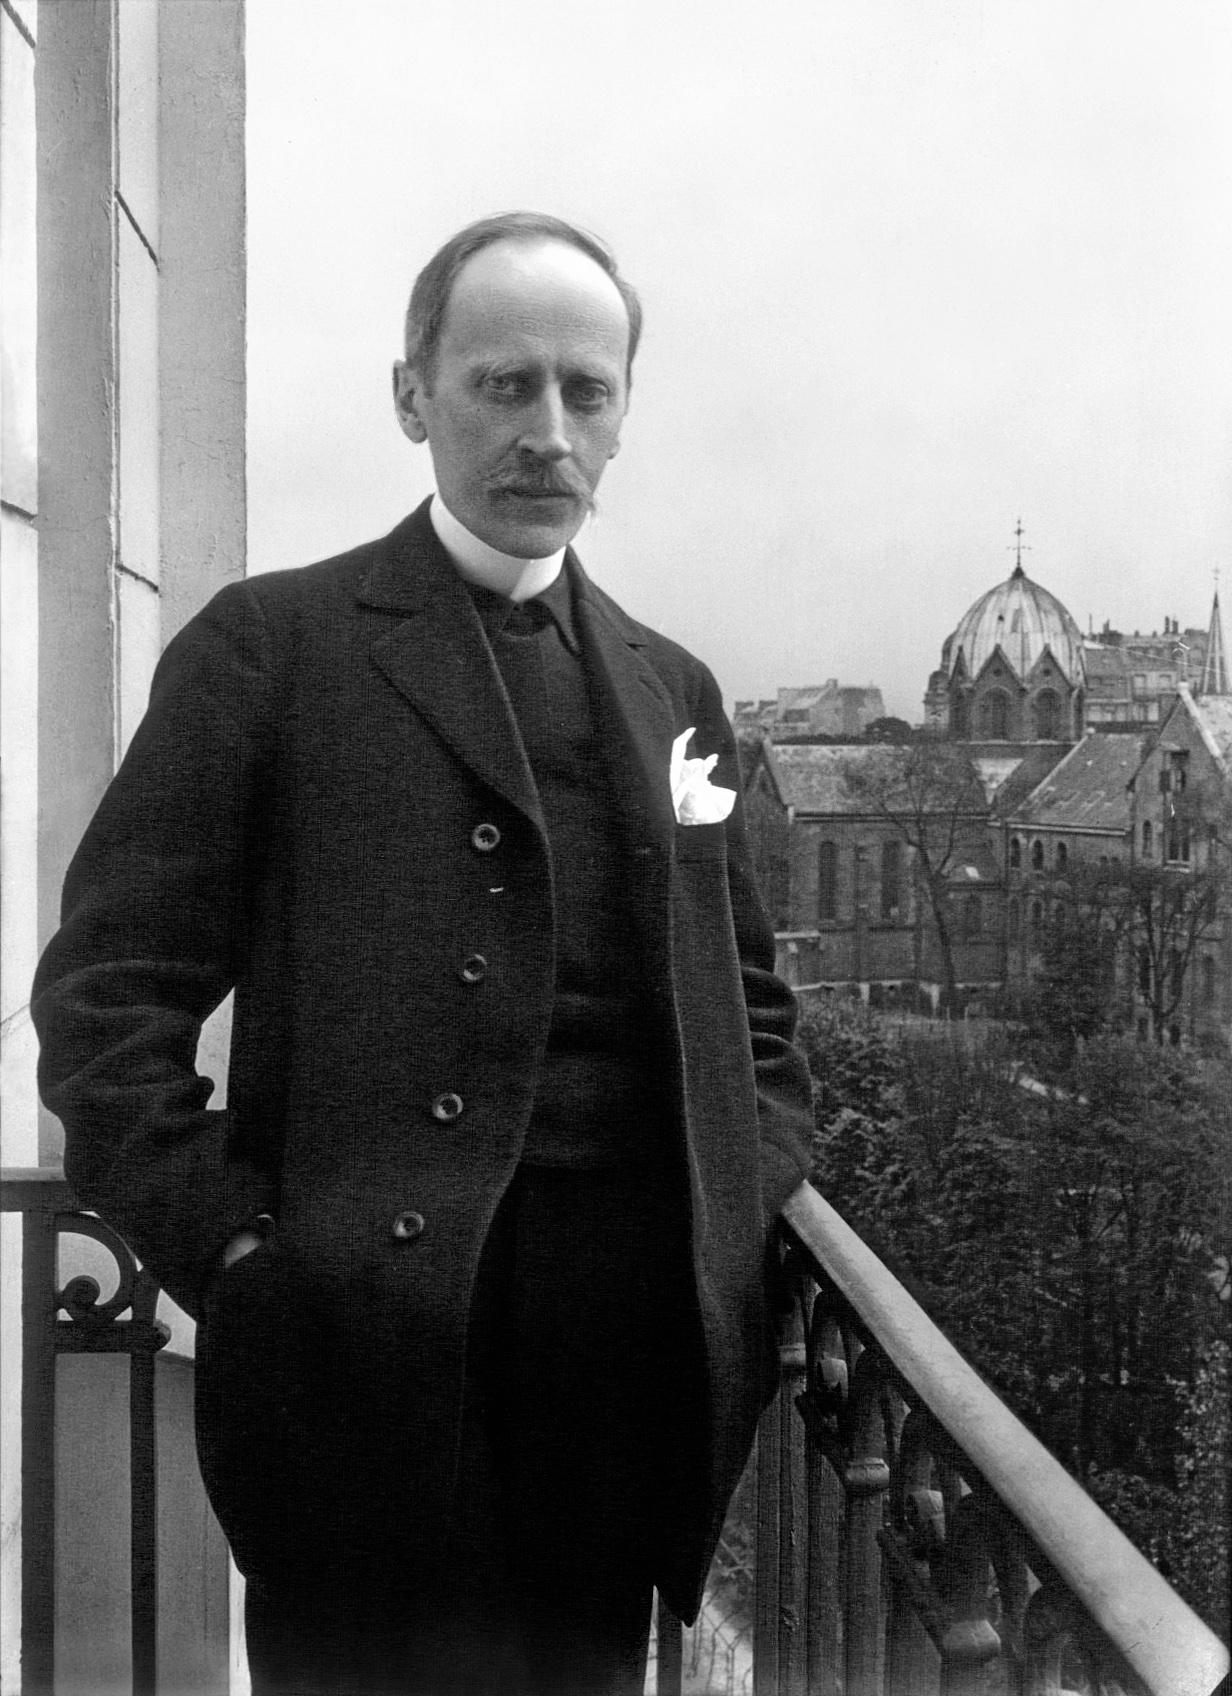 https://upload.wikimedia.org/wikipedia/commons/2/29/Romain_Rolland_de_face_au_balcon,_Meurisse,_1914_retouche.jpg